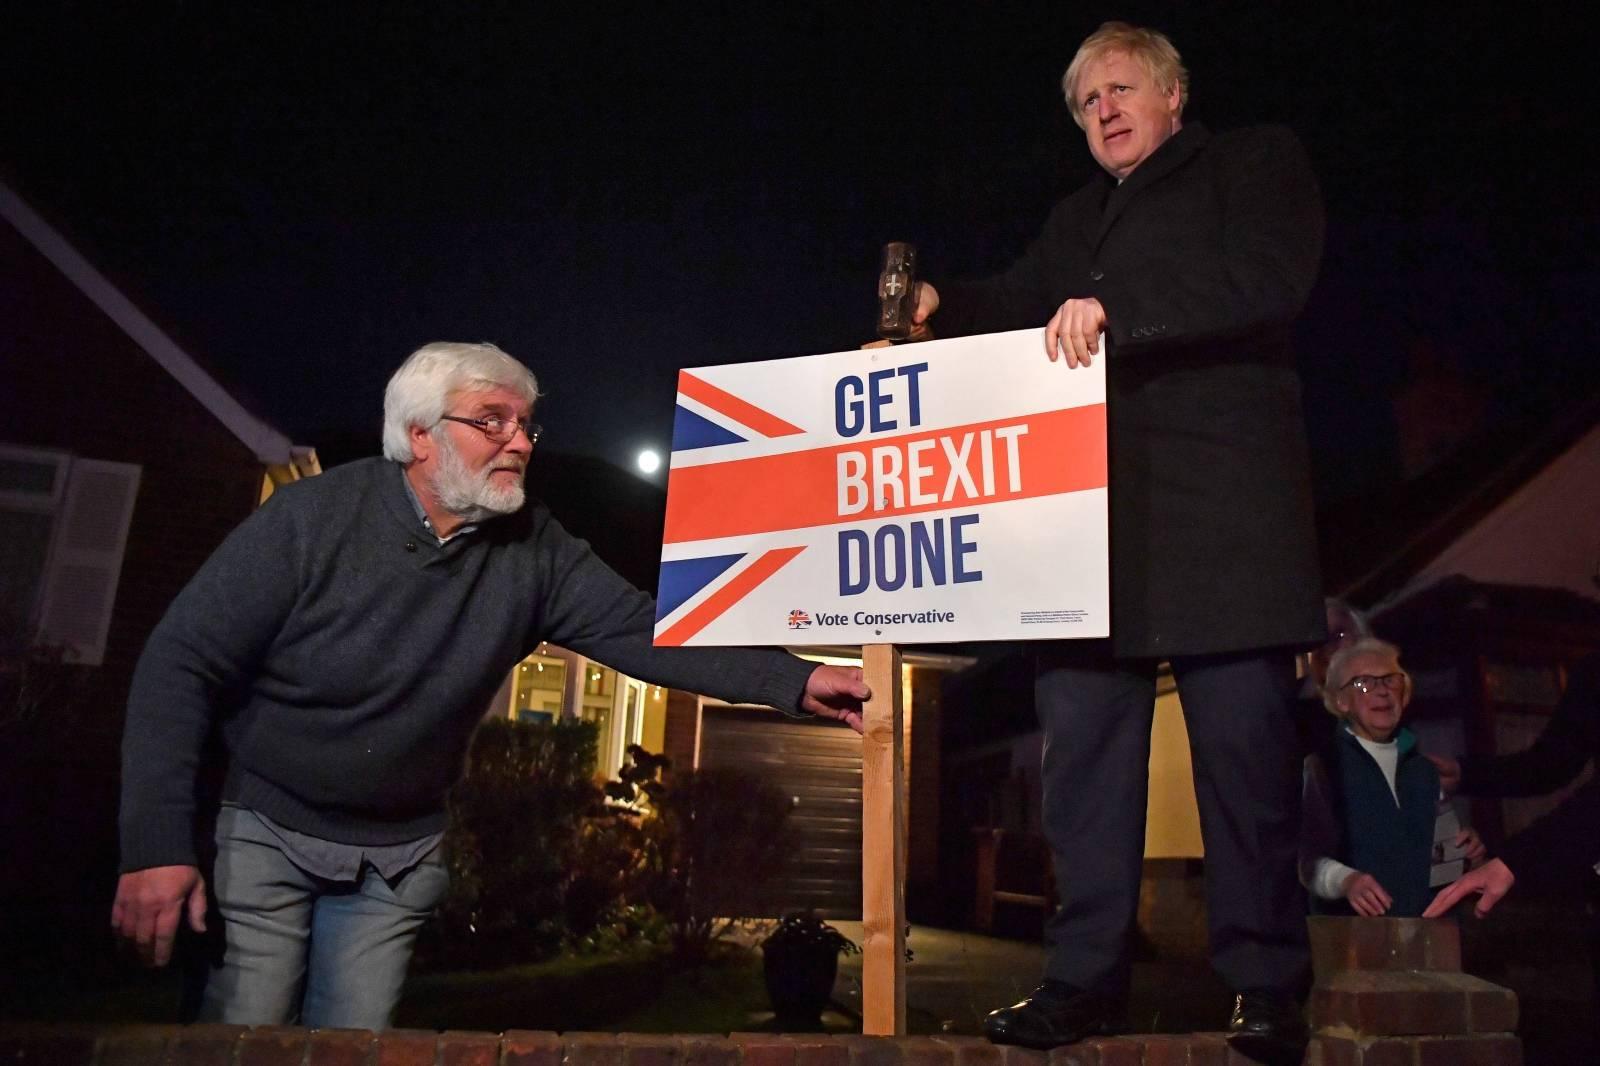 Britain's Prime Minister Boris Johnson campaigns in South Benfleet